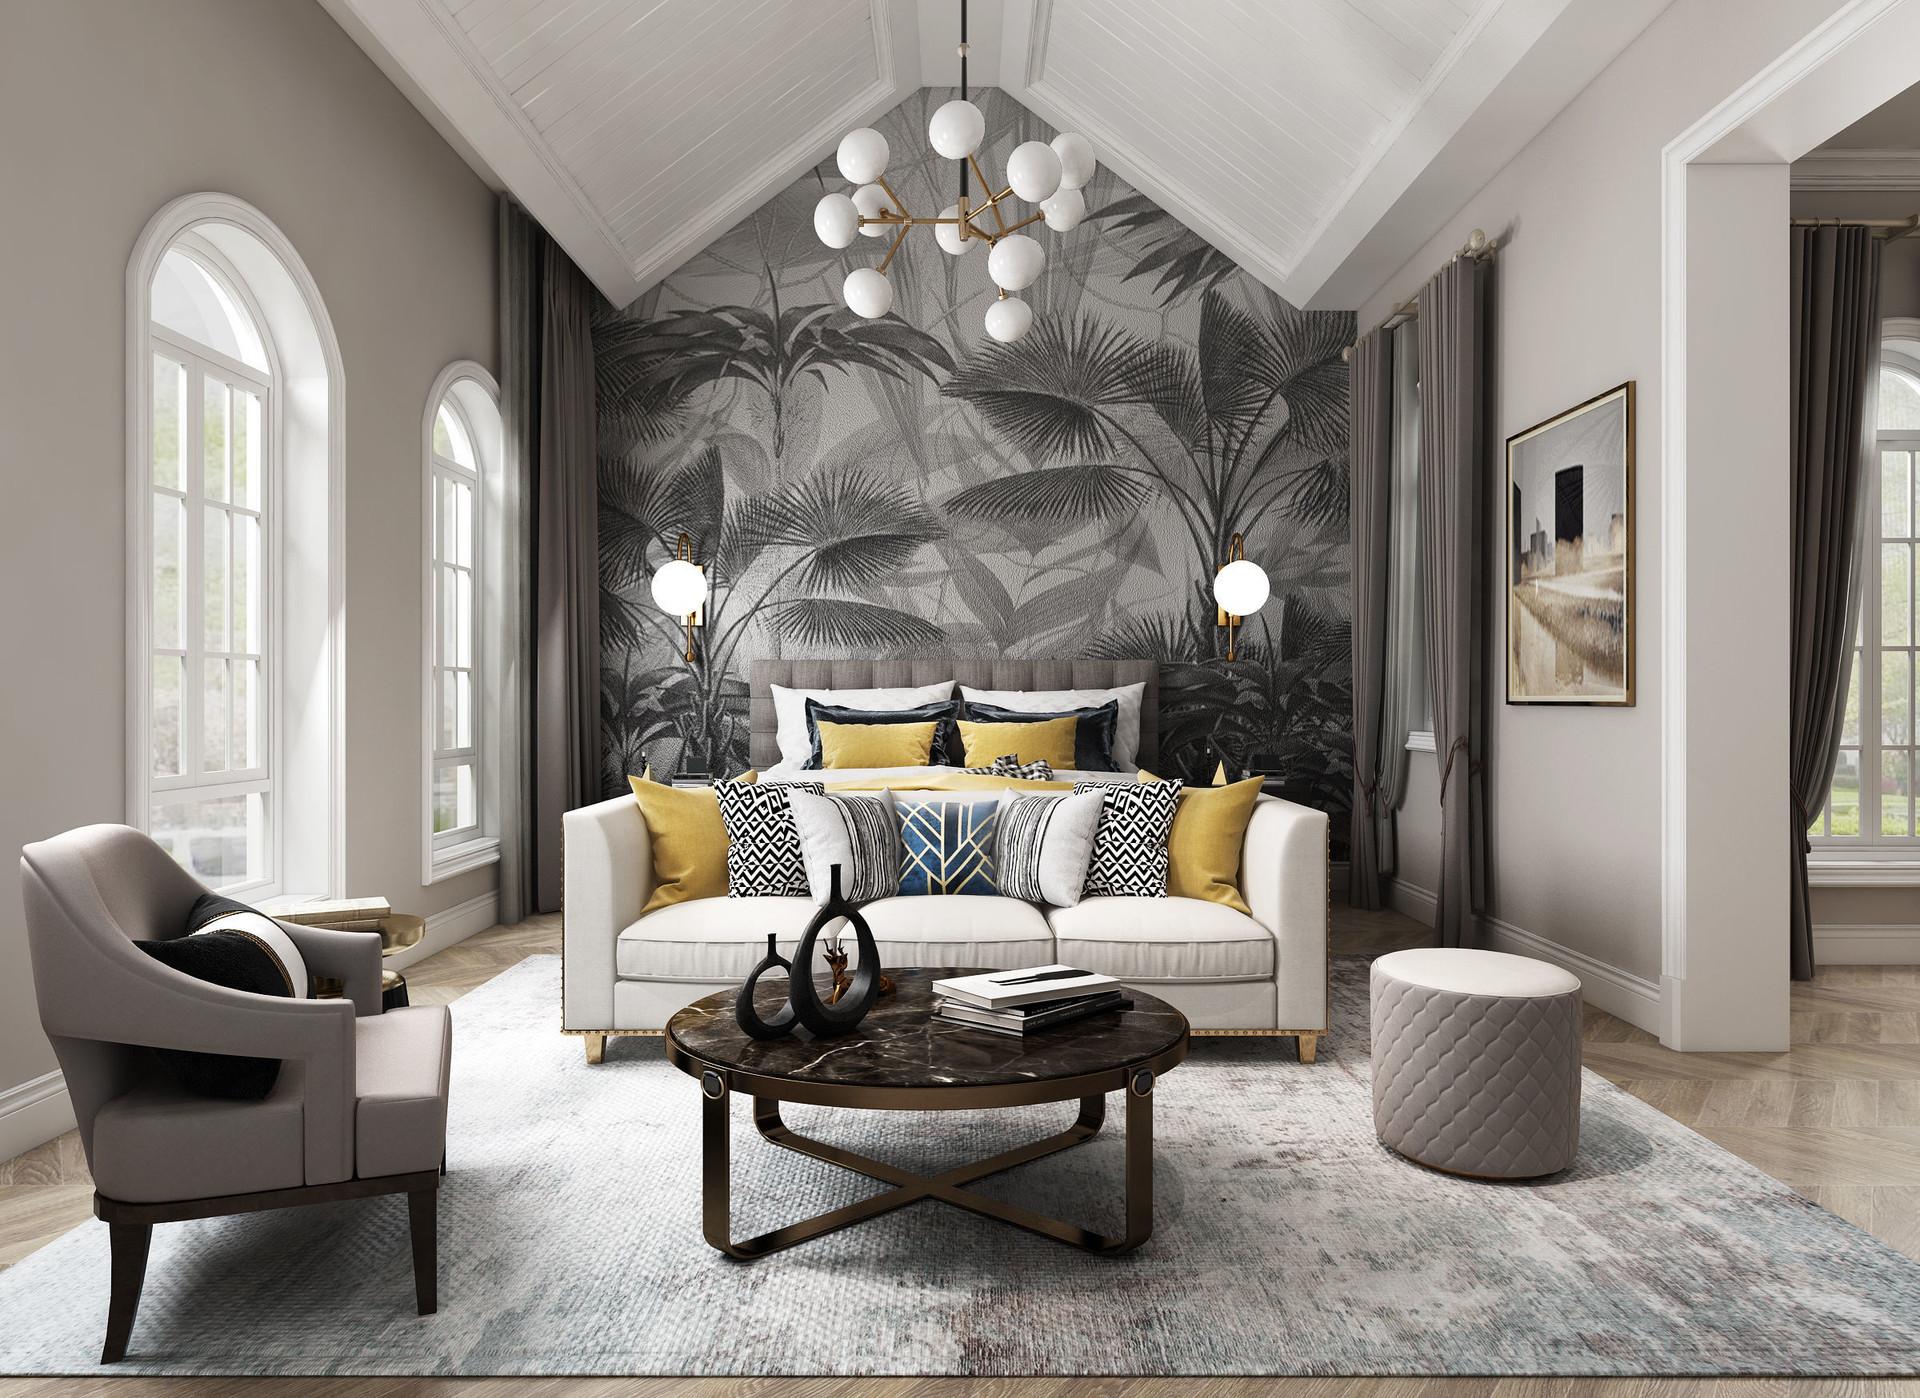 bedroom-3d-model-max-obj-3ds-fbx (3).jpg